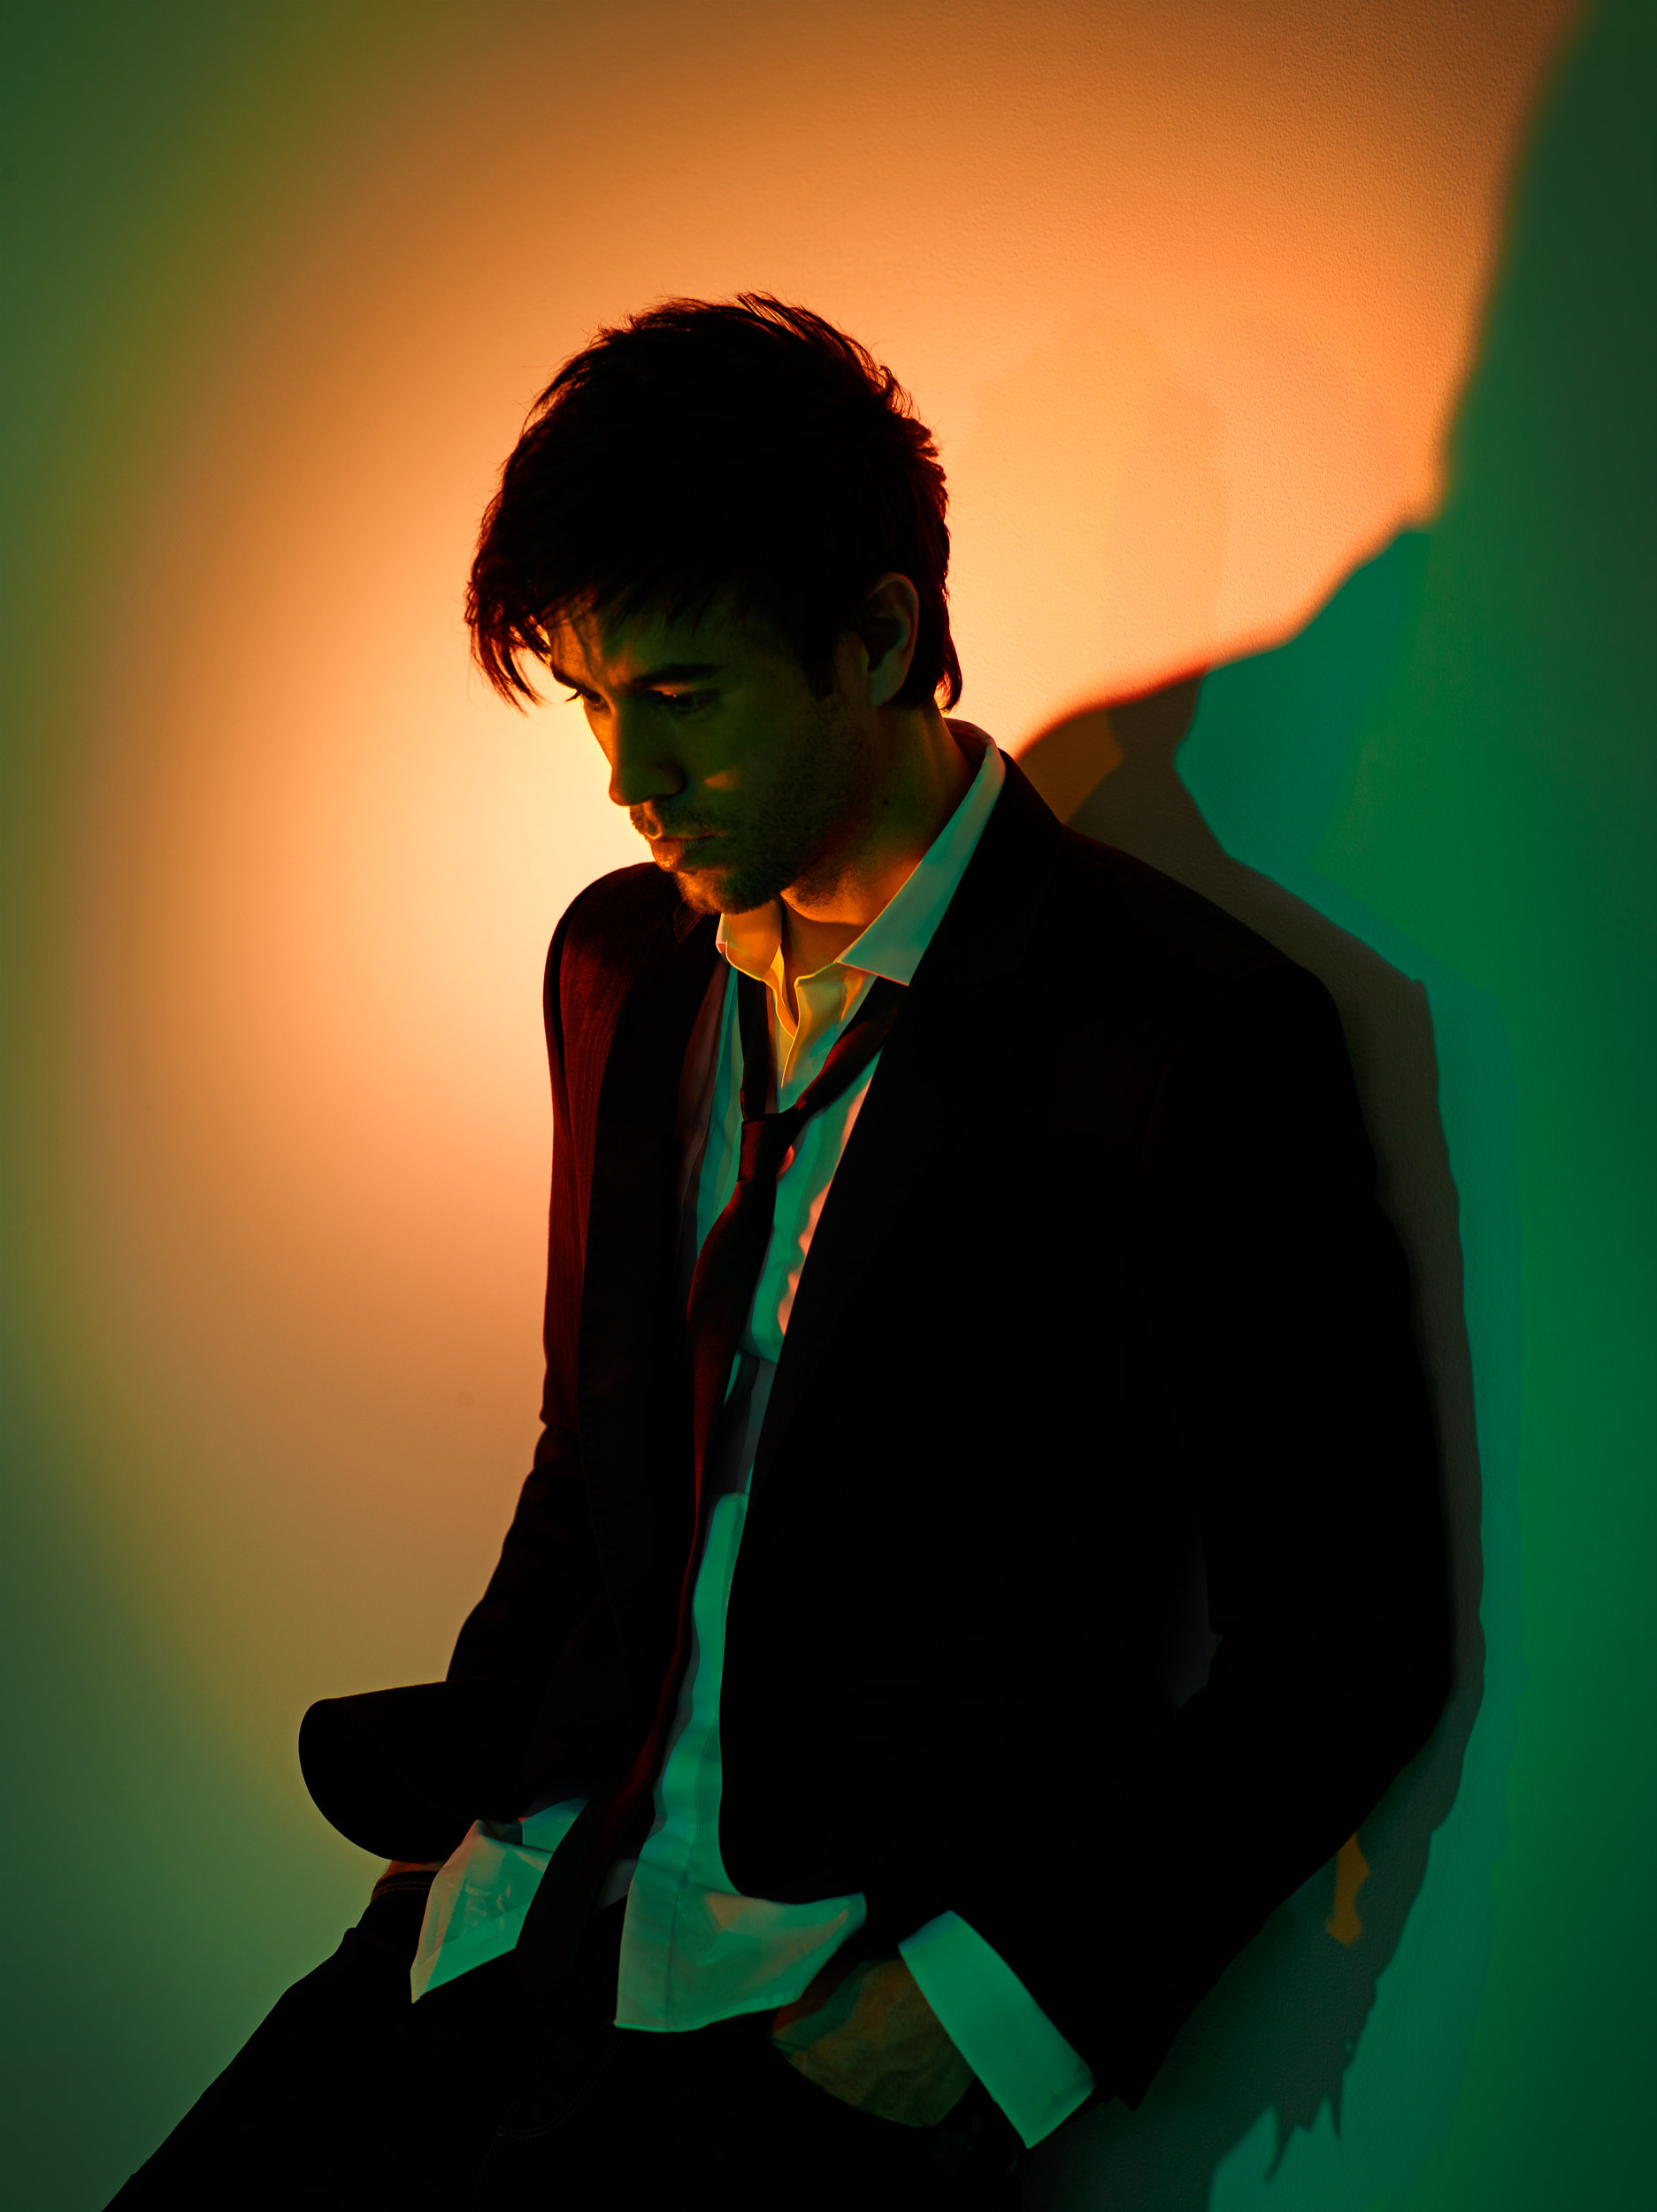 Enrique_Iglesias-Chapman_Baehler27.jpg